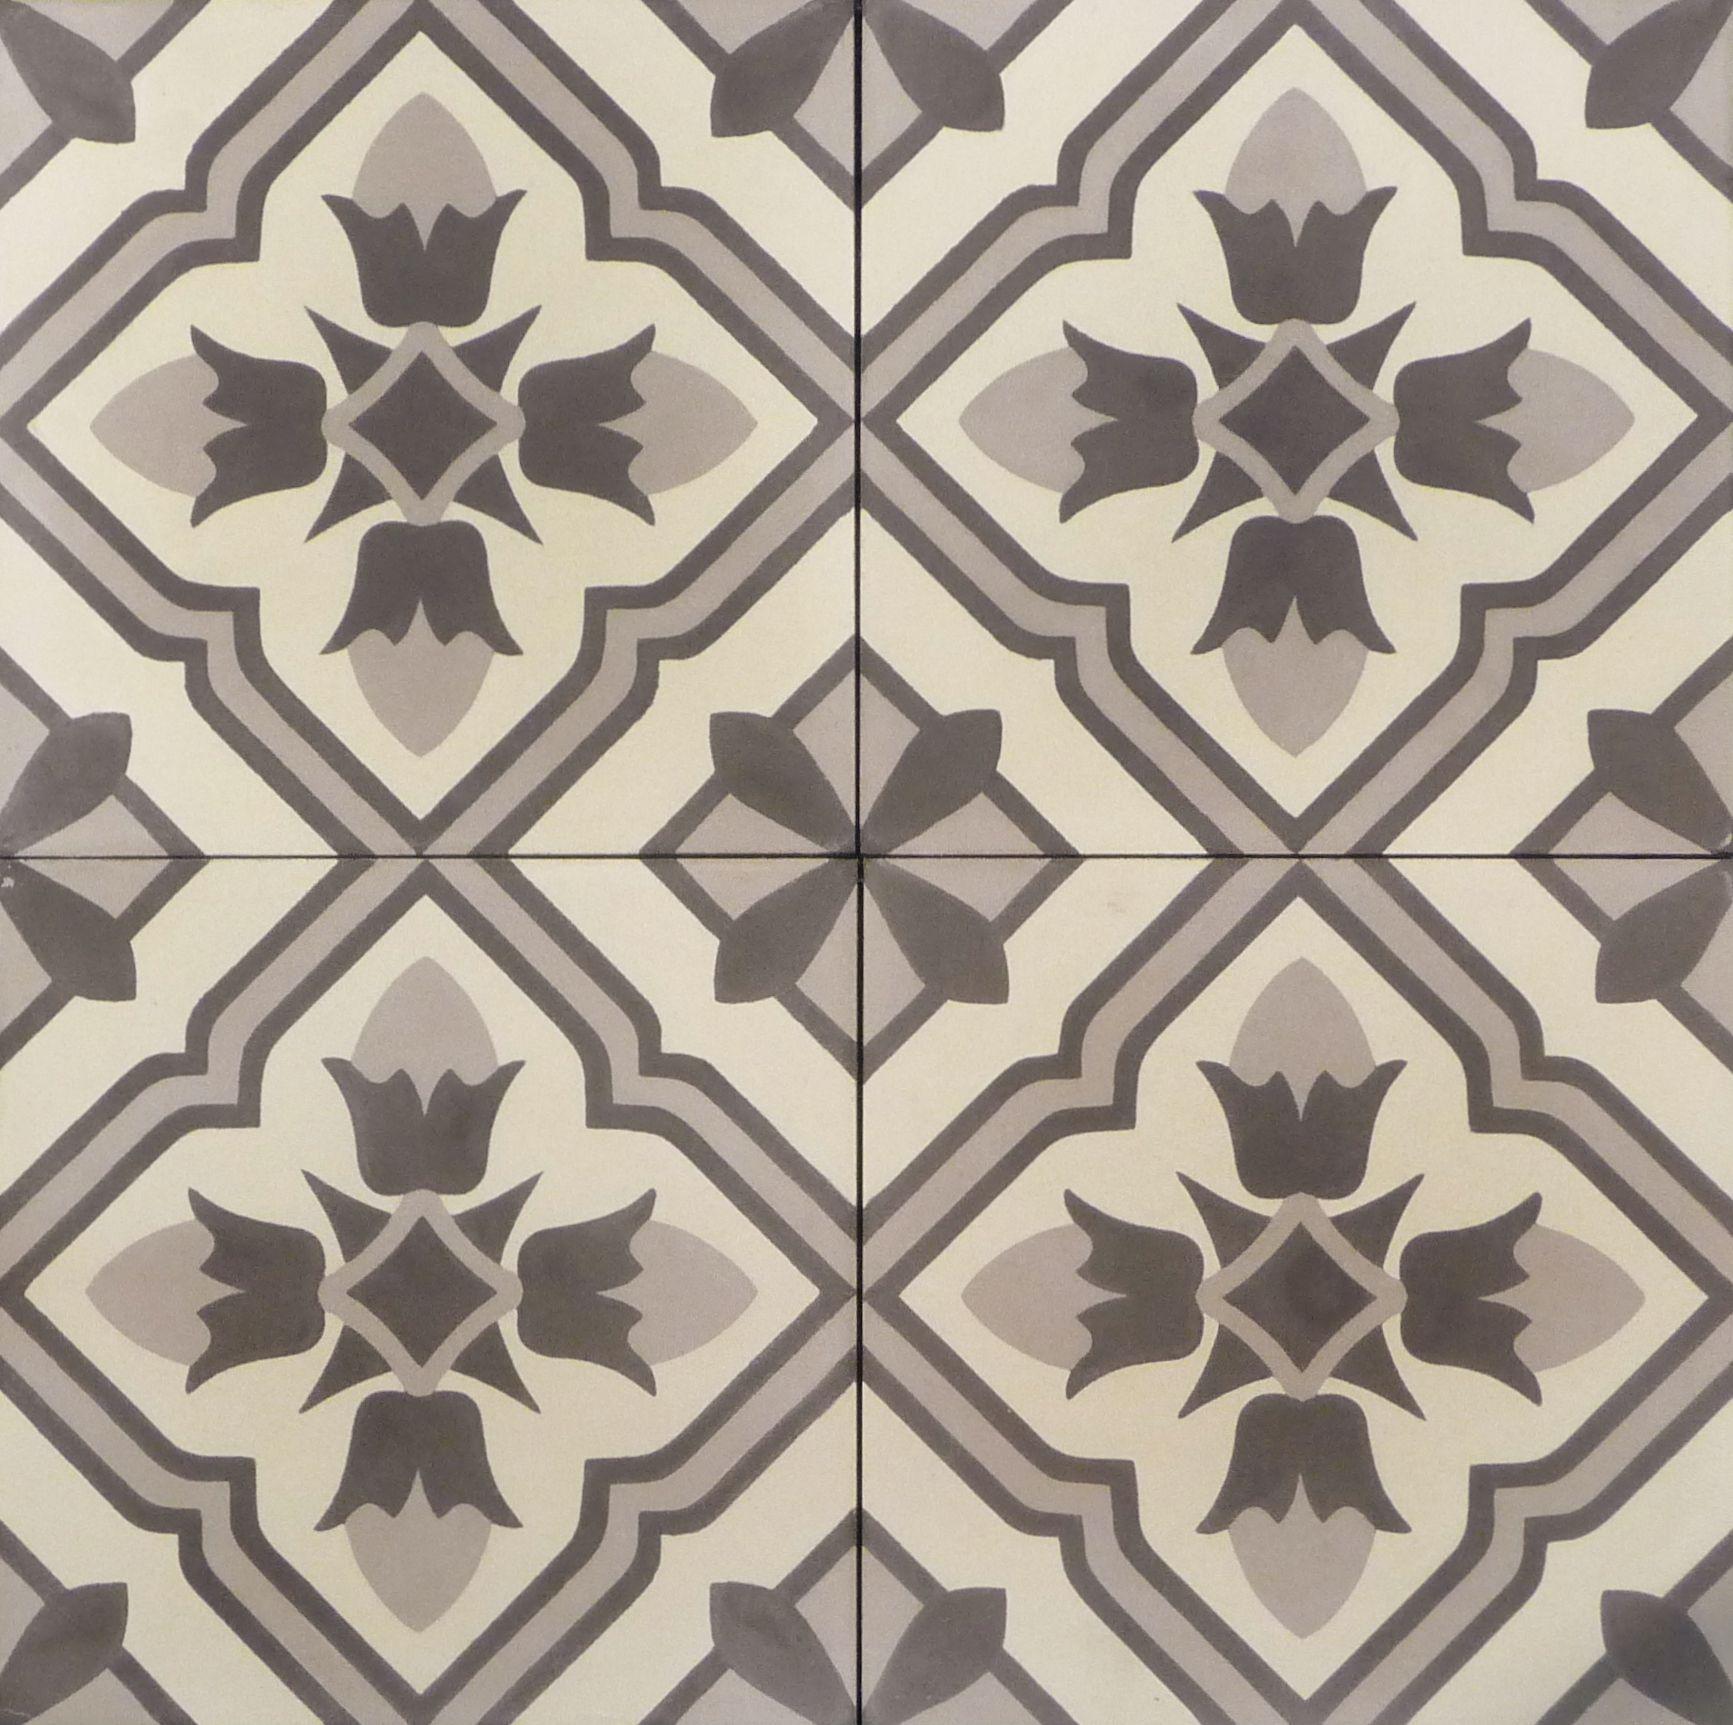 Floor Decor Ideas Lake Tile And More Store Orlando: Noga Cement Tiles